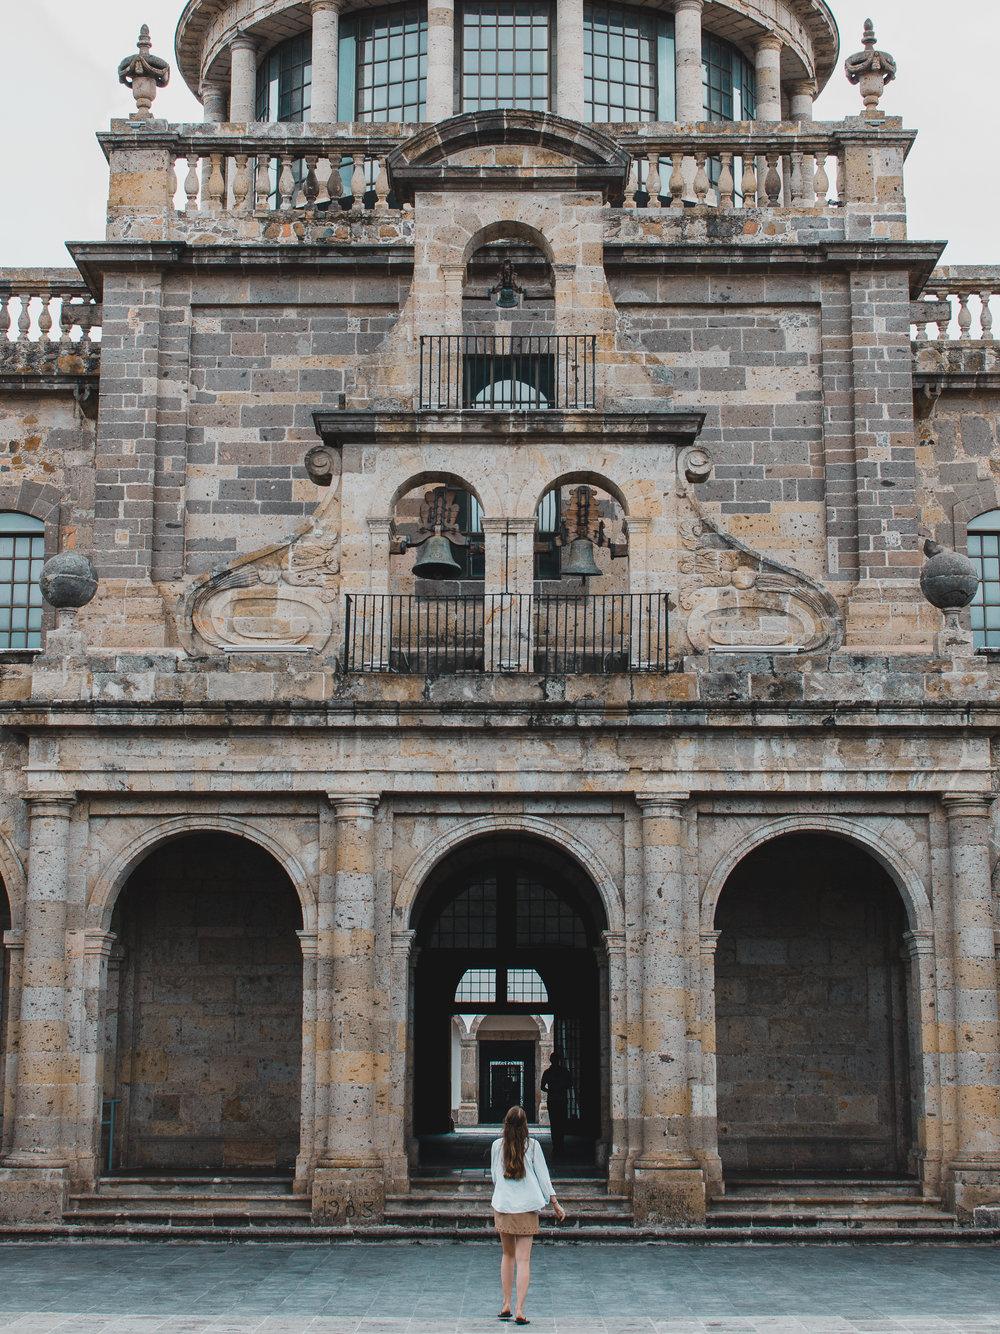 We spend hours walking around Instituto Cultural Cabanas